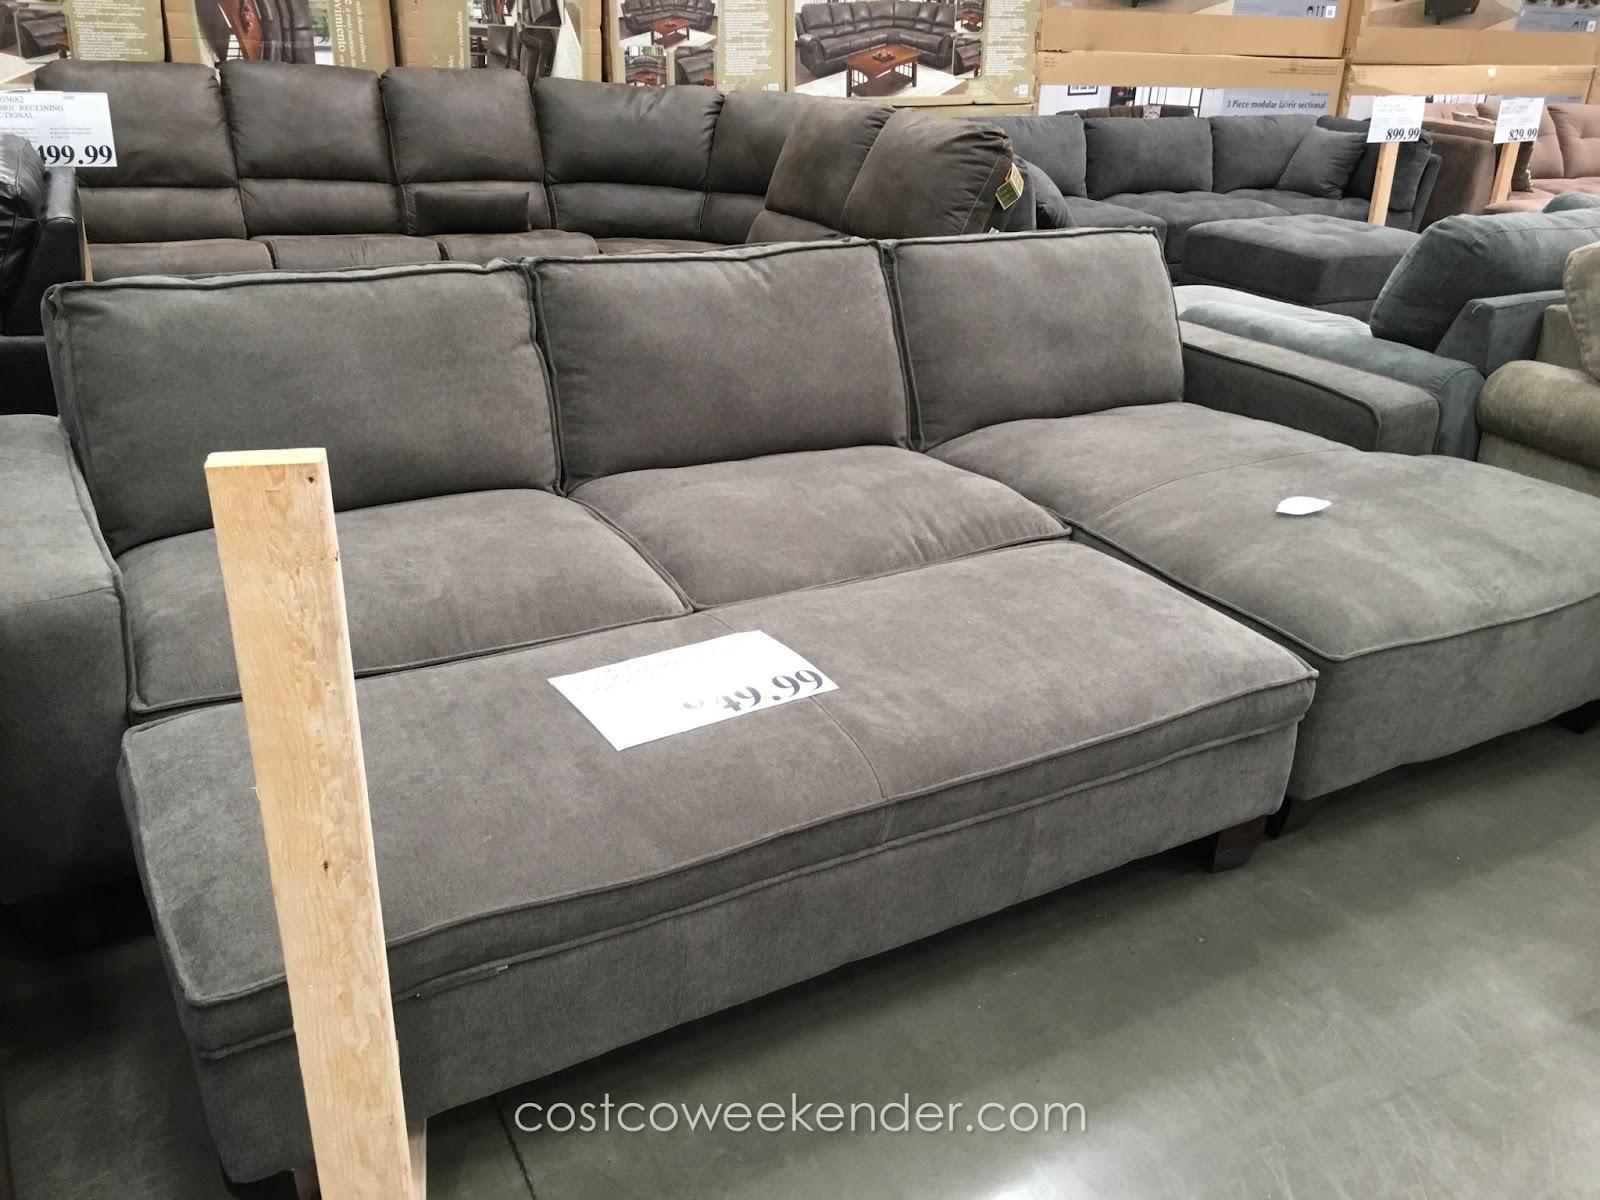 Sofas Center : Costco Recliner Sofa Berkline Reclining Power Sofas With Berkline Reclining Sofas (View 16 of 20)